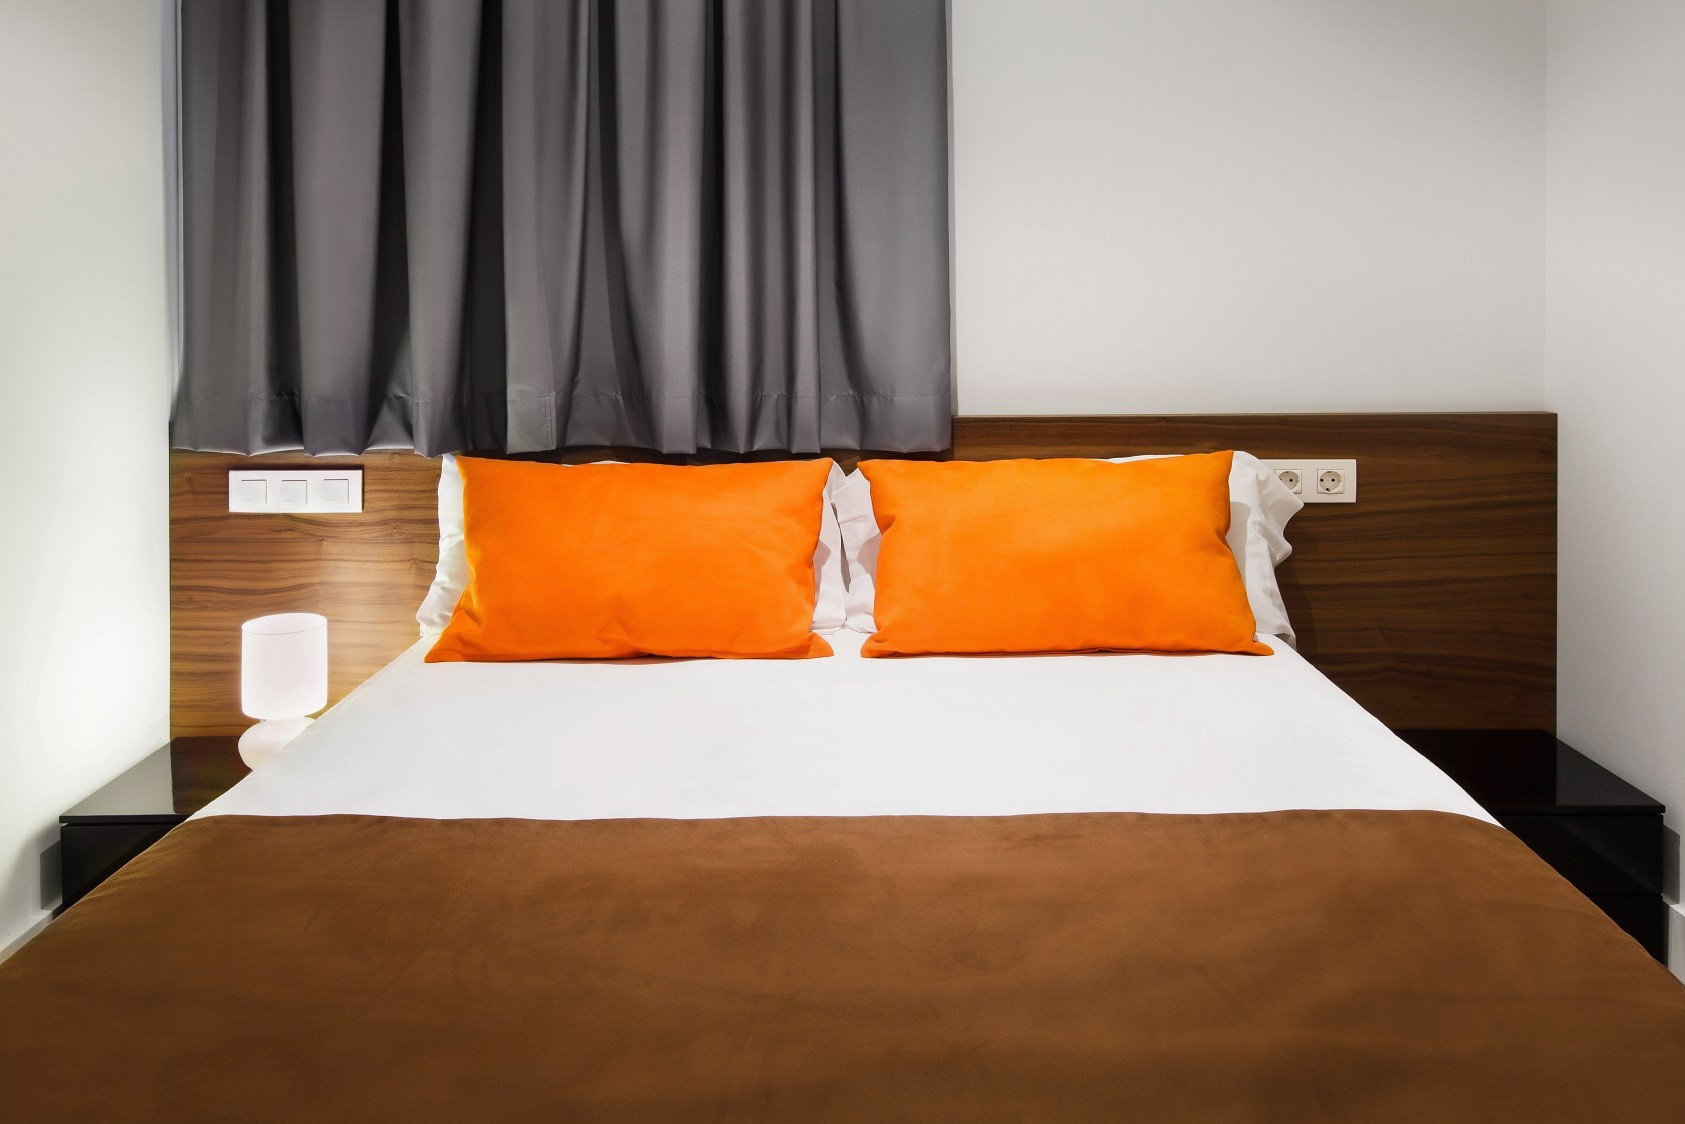 Dailyflats Sagrada Familia area Classic 1-bedroom (1-4 adults) apartments in Barcelona 7